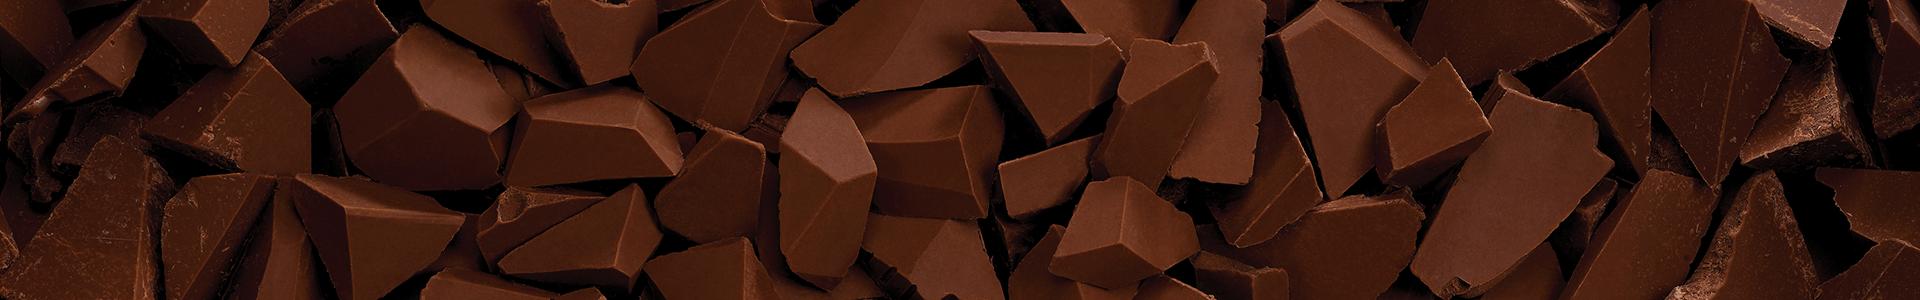 bg-chocolat-85c5a3dc7a76f6d7bb869c0380b4f9e198988ef18bb00810f881ae0a49086306